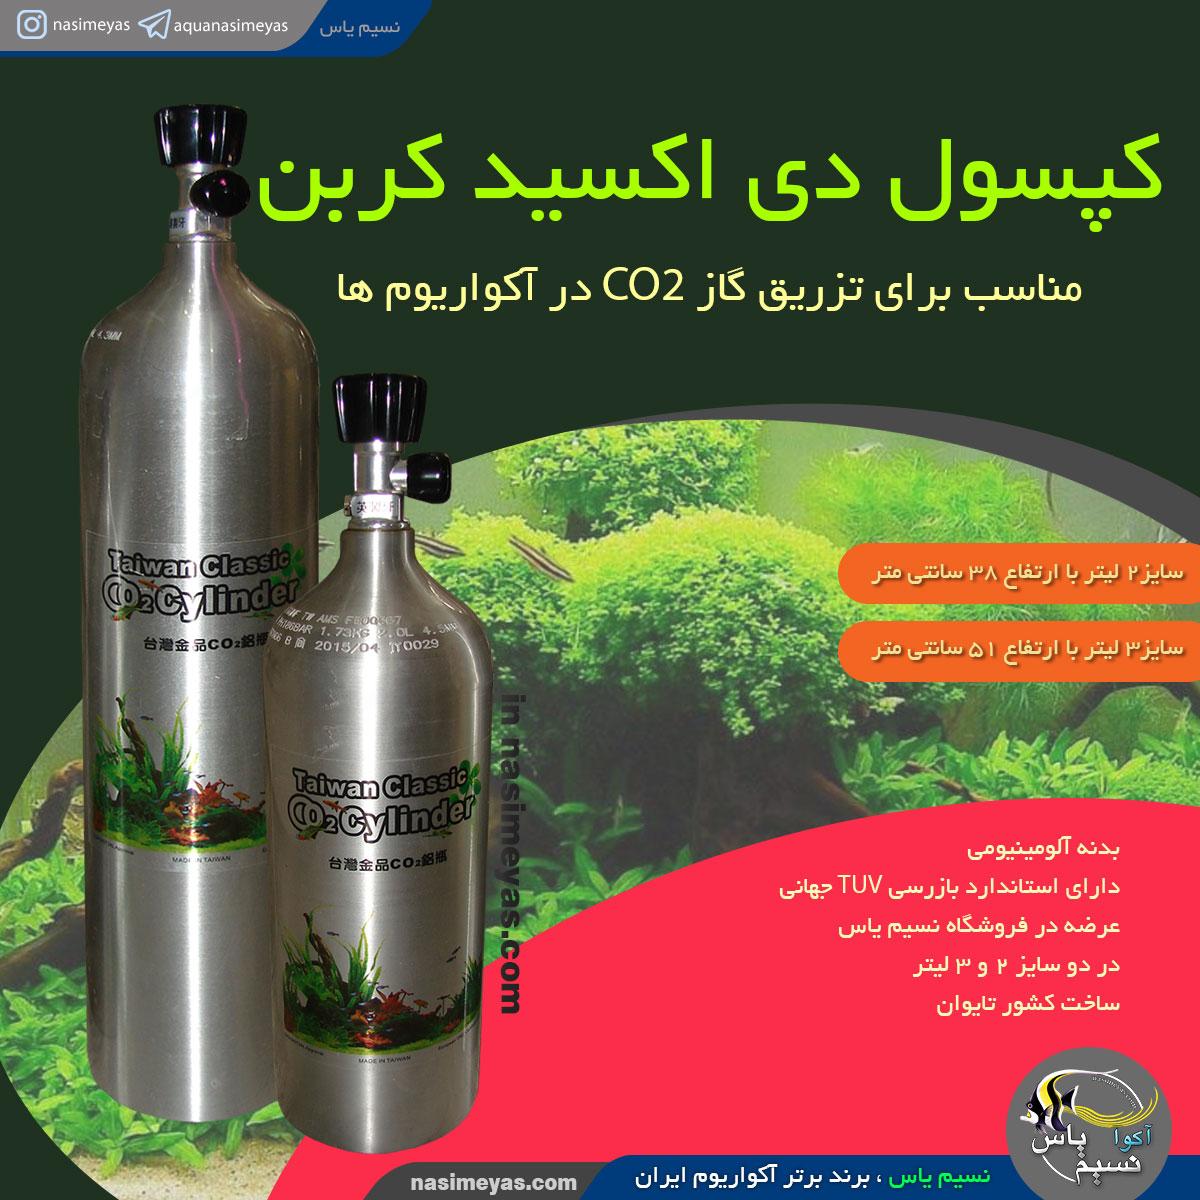 کپسول CO2 آلومینیومی تایوانی ۲ لیتری